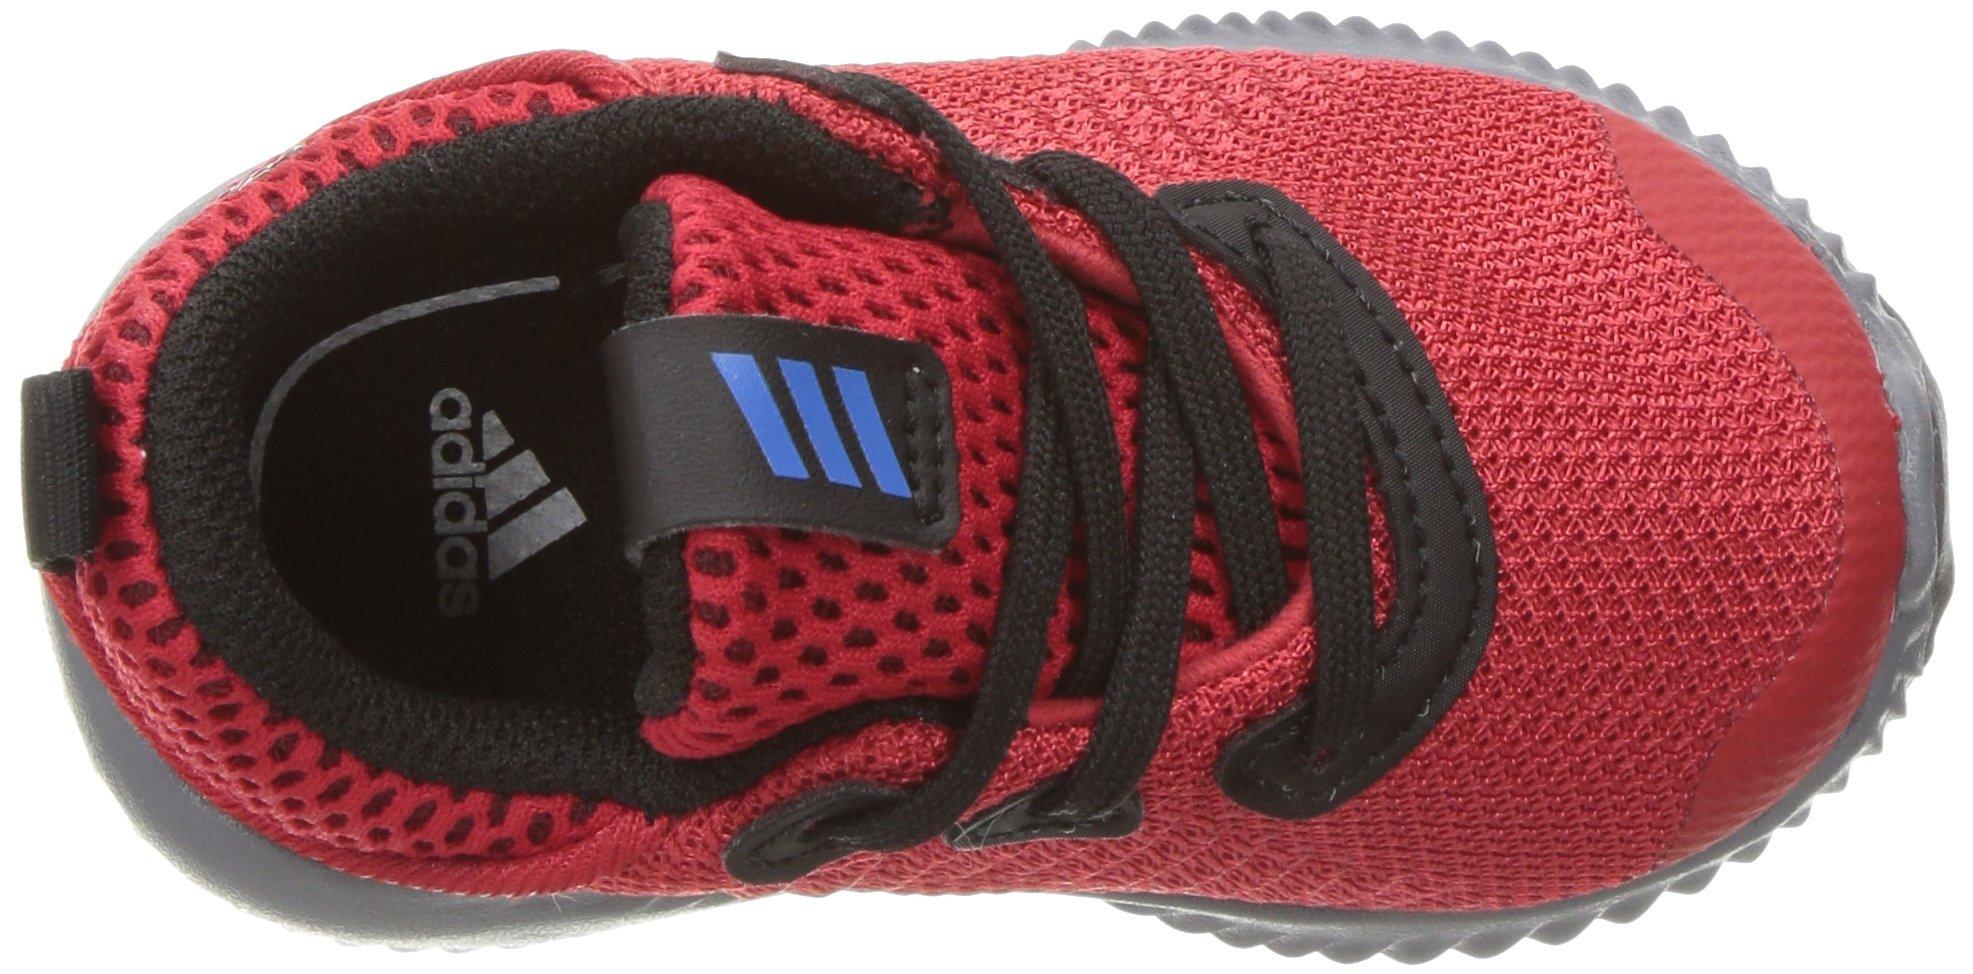 adidas Kids' Alphabounce Sneaker, Scarlet/Satellite/Black, 8 M US Toddler by adidas (Image #8)